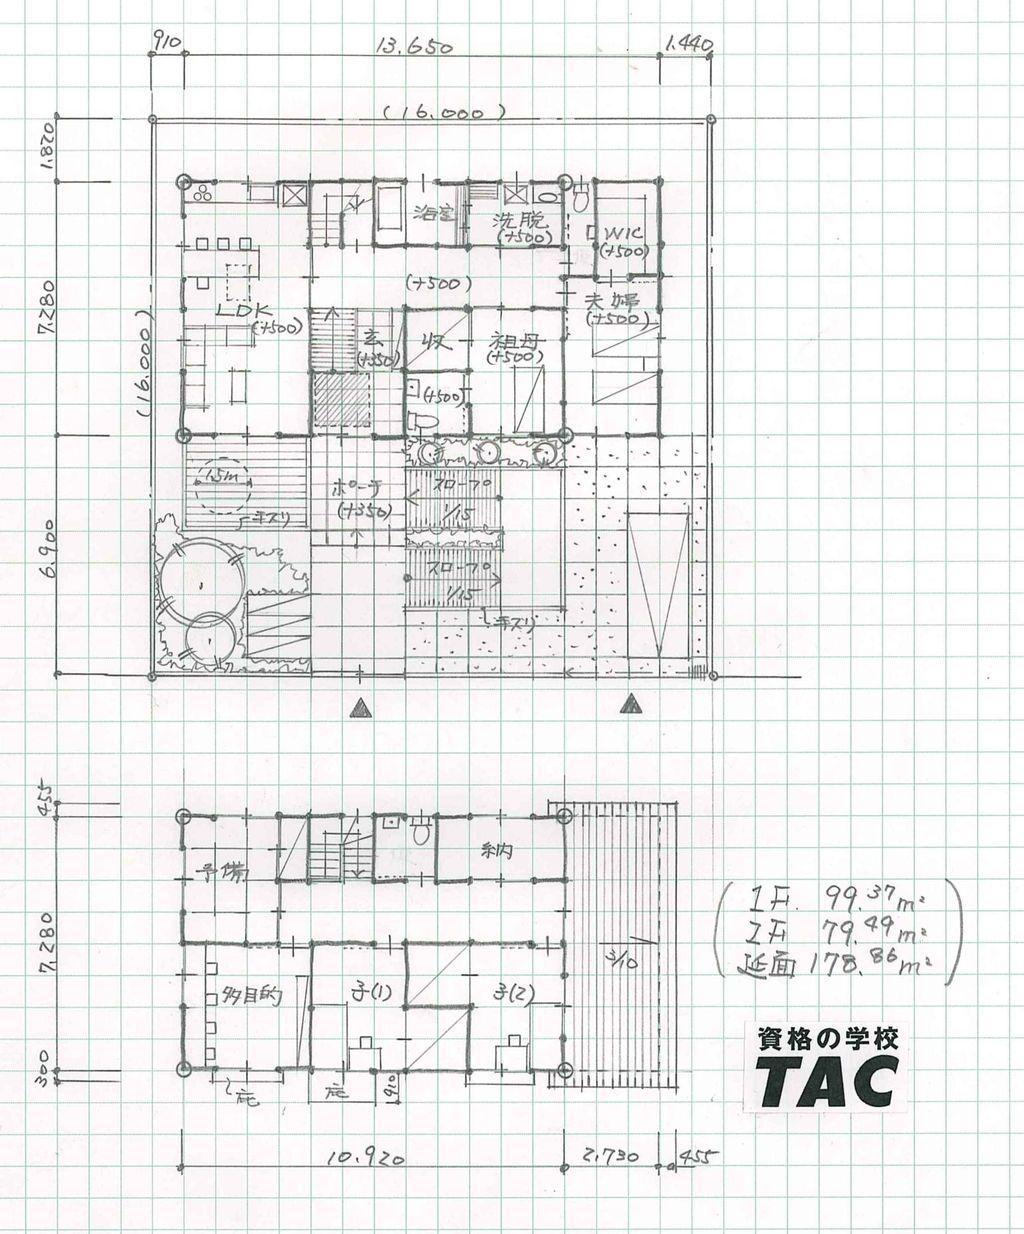 H26_資格の学校TAC_2級建築士設計製図答案例